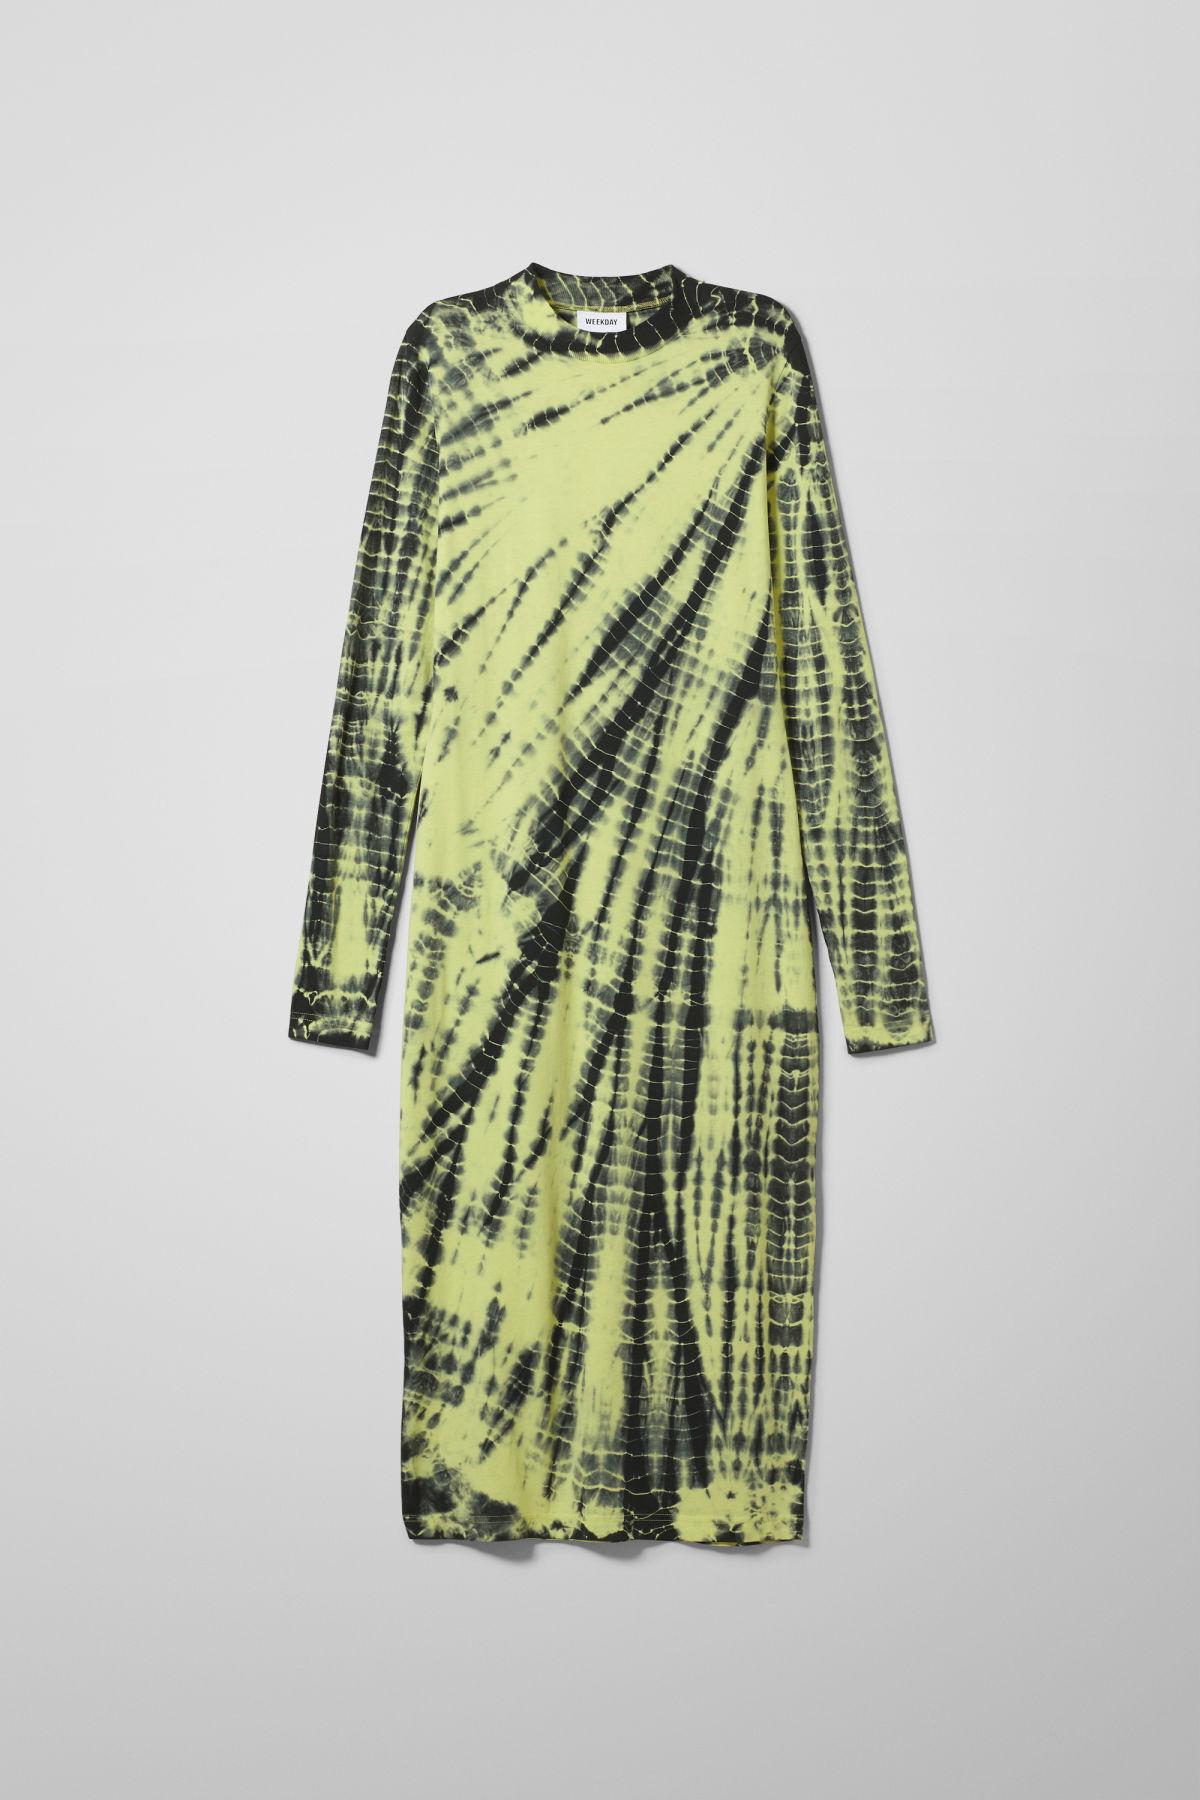 Image of Meja Dress - Yellow-XS